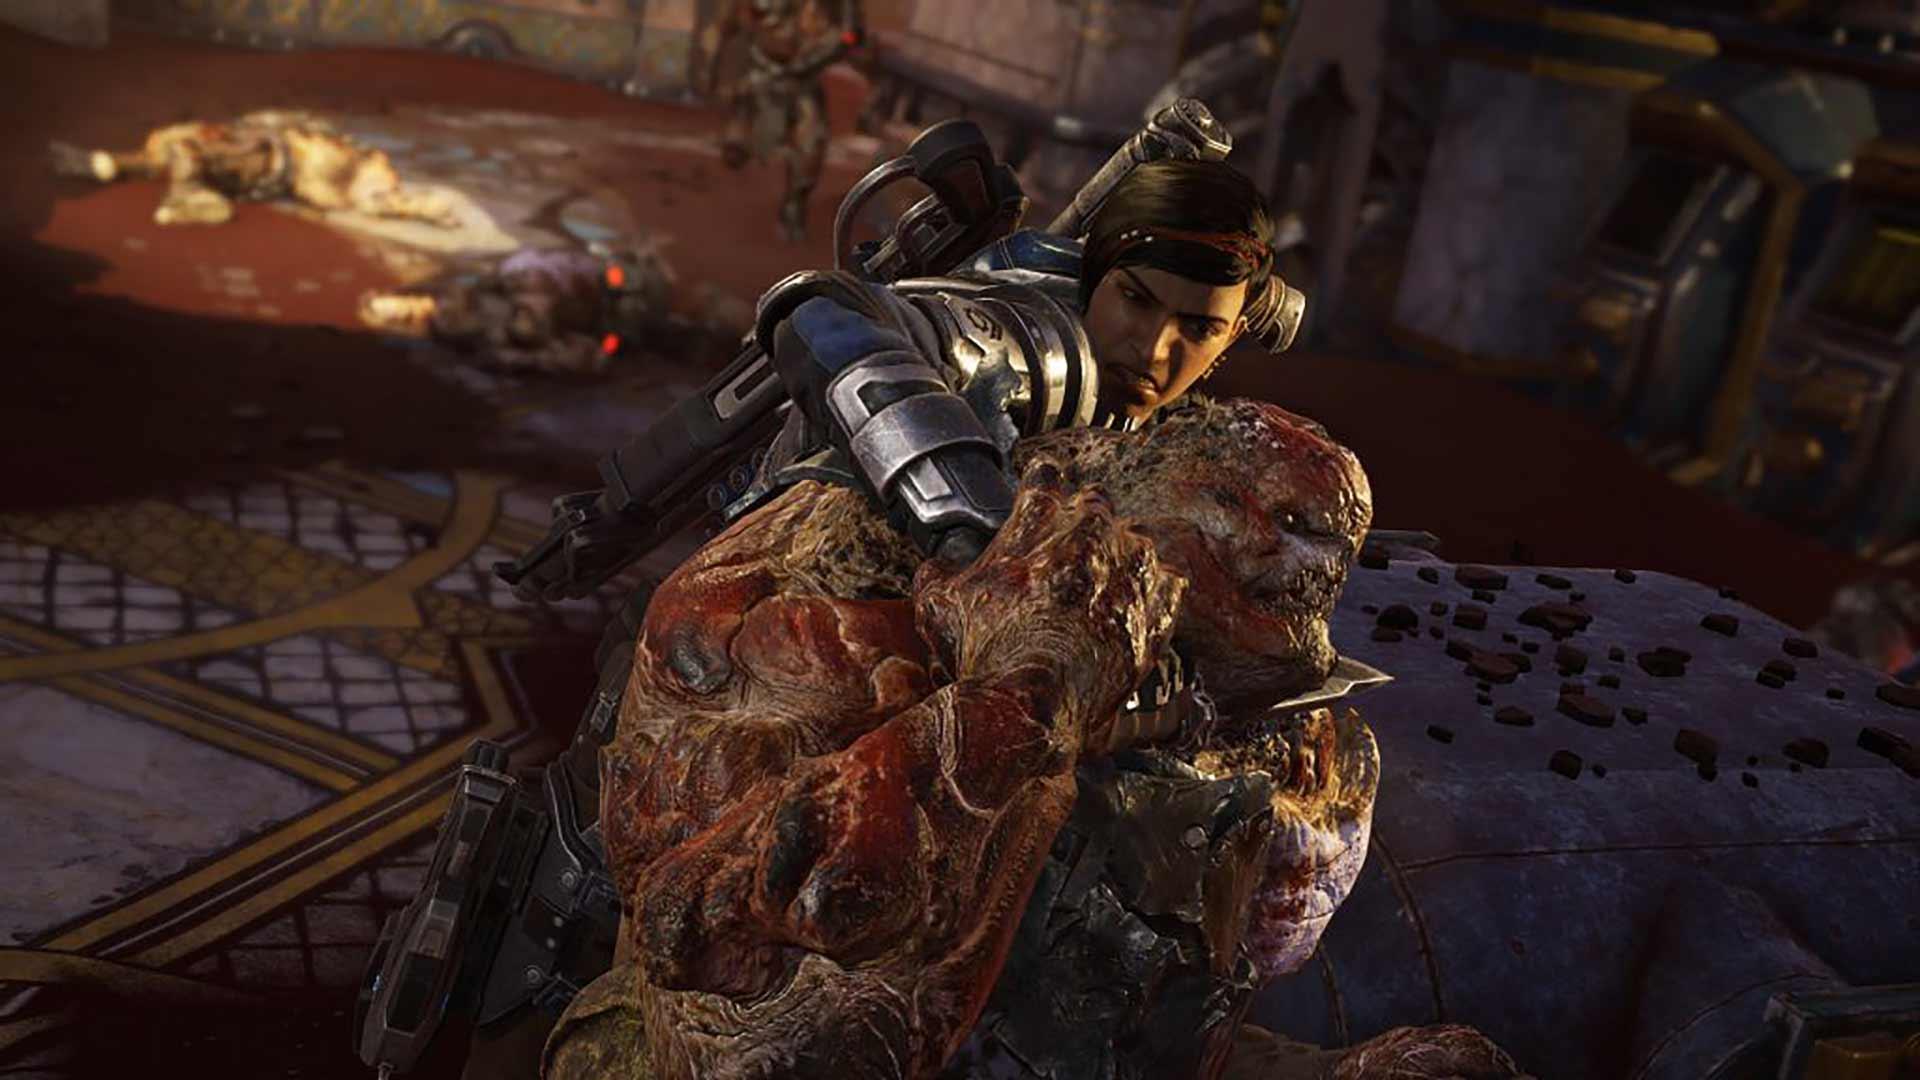 Gears 5 multiplayer director talks evolving Horde Mode, Halo